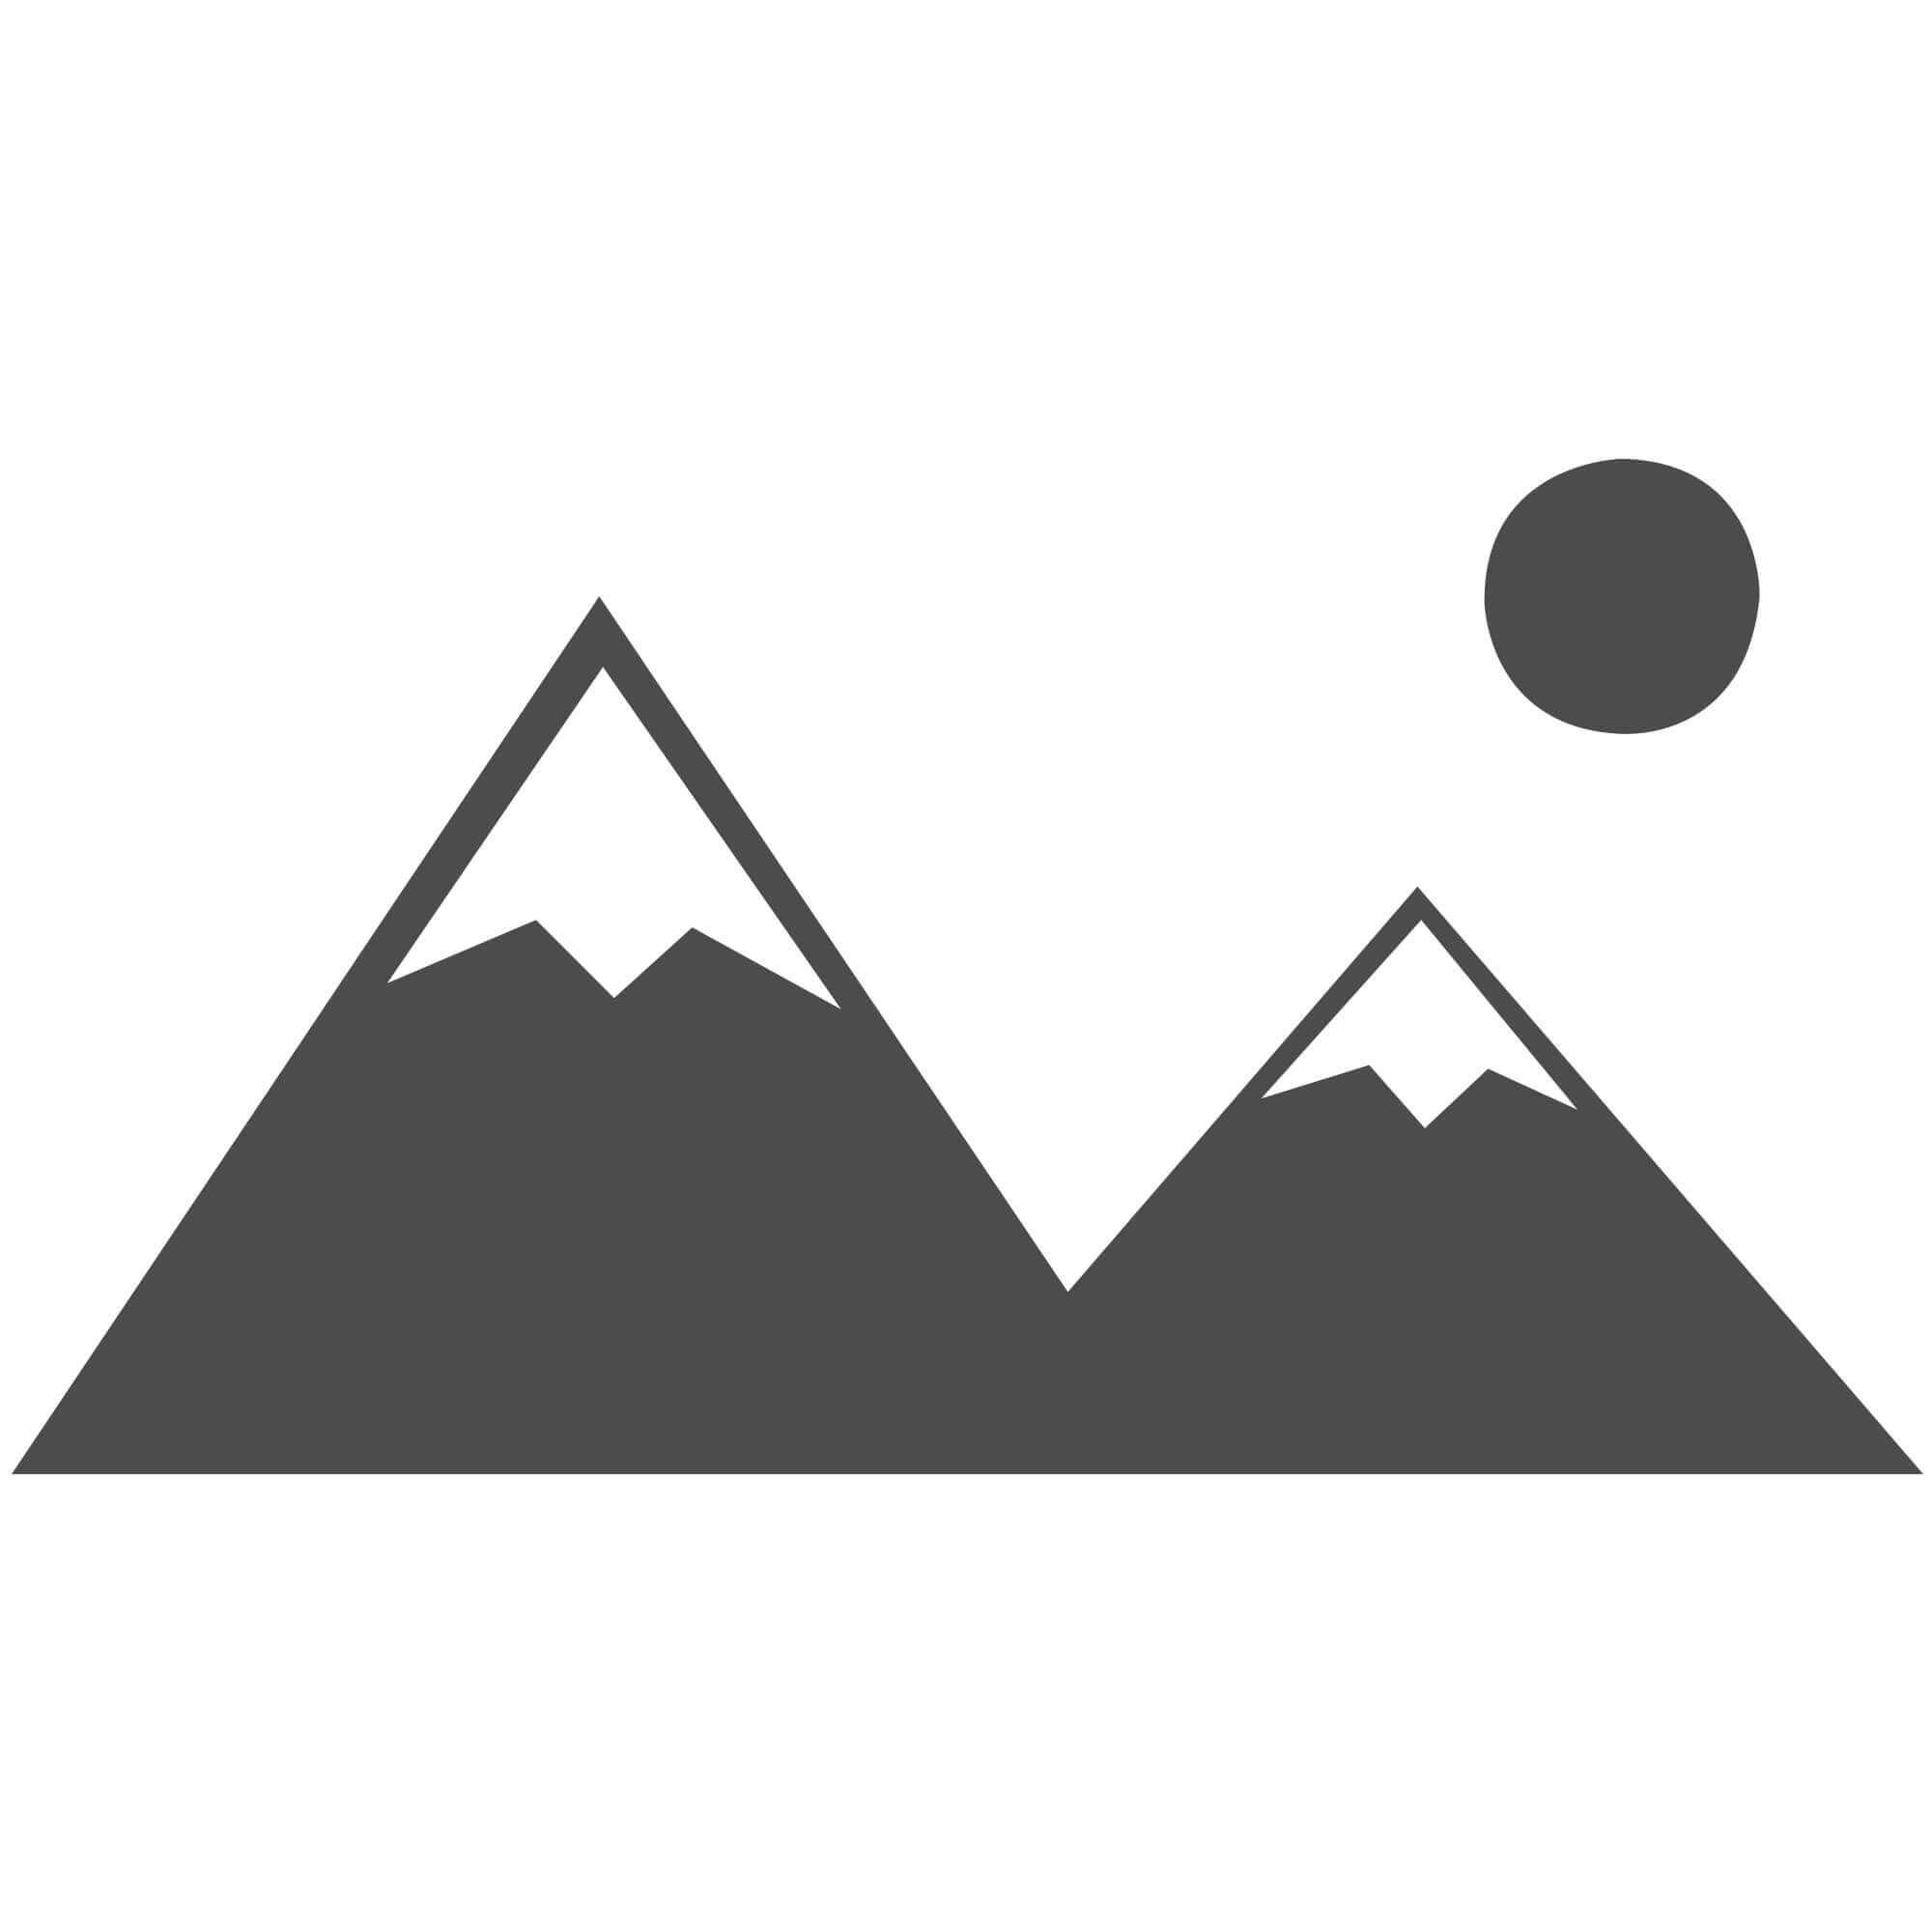 "Dazzle Shaggy Rug - Charcoal - Size 60 x 110 cm (2' x 3'7"")"